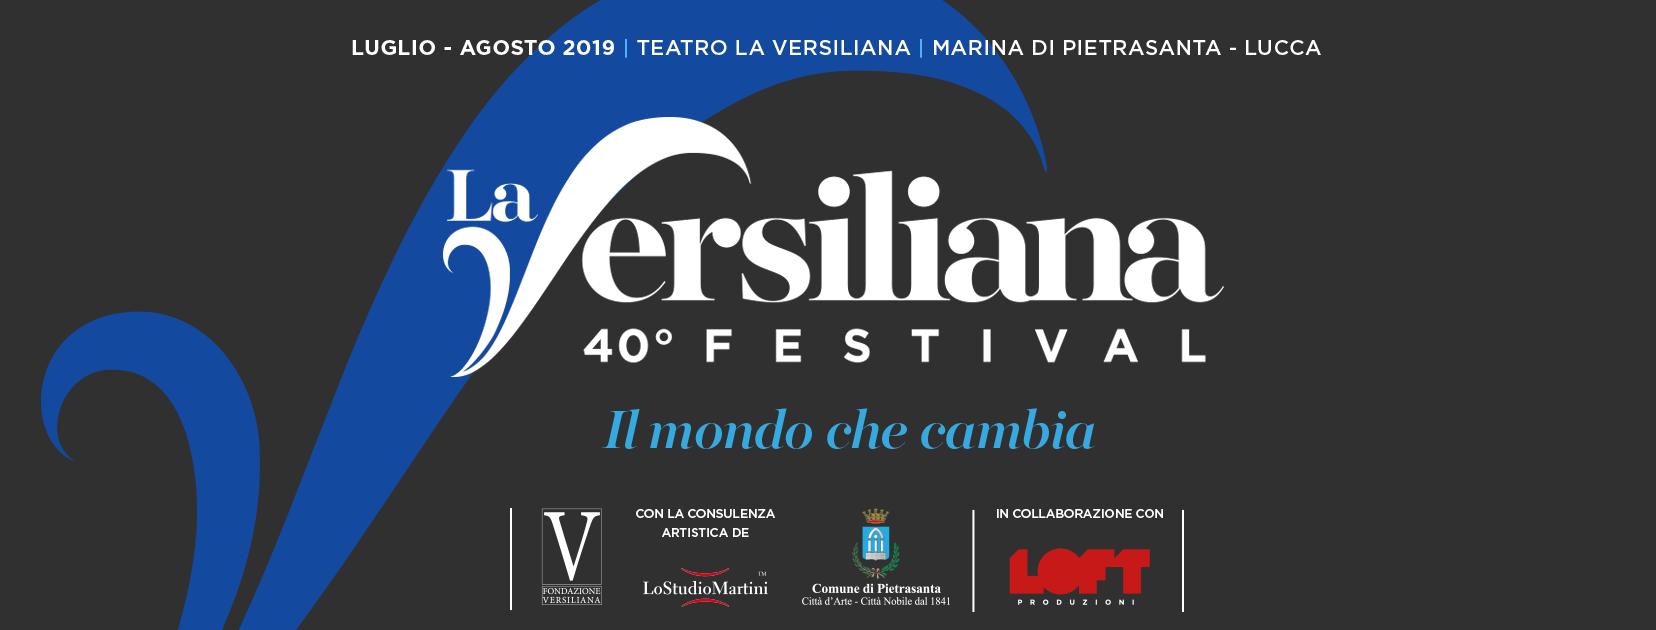 Versiliana 2019